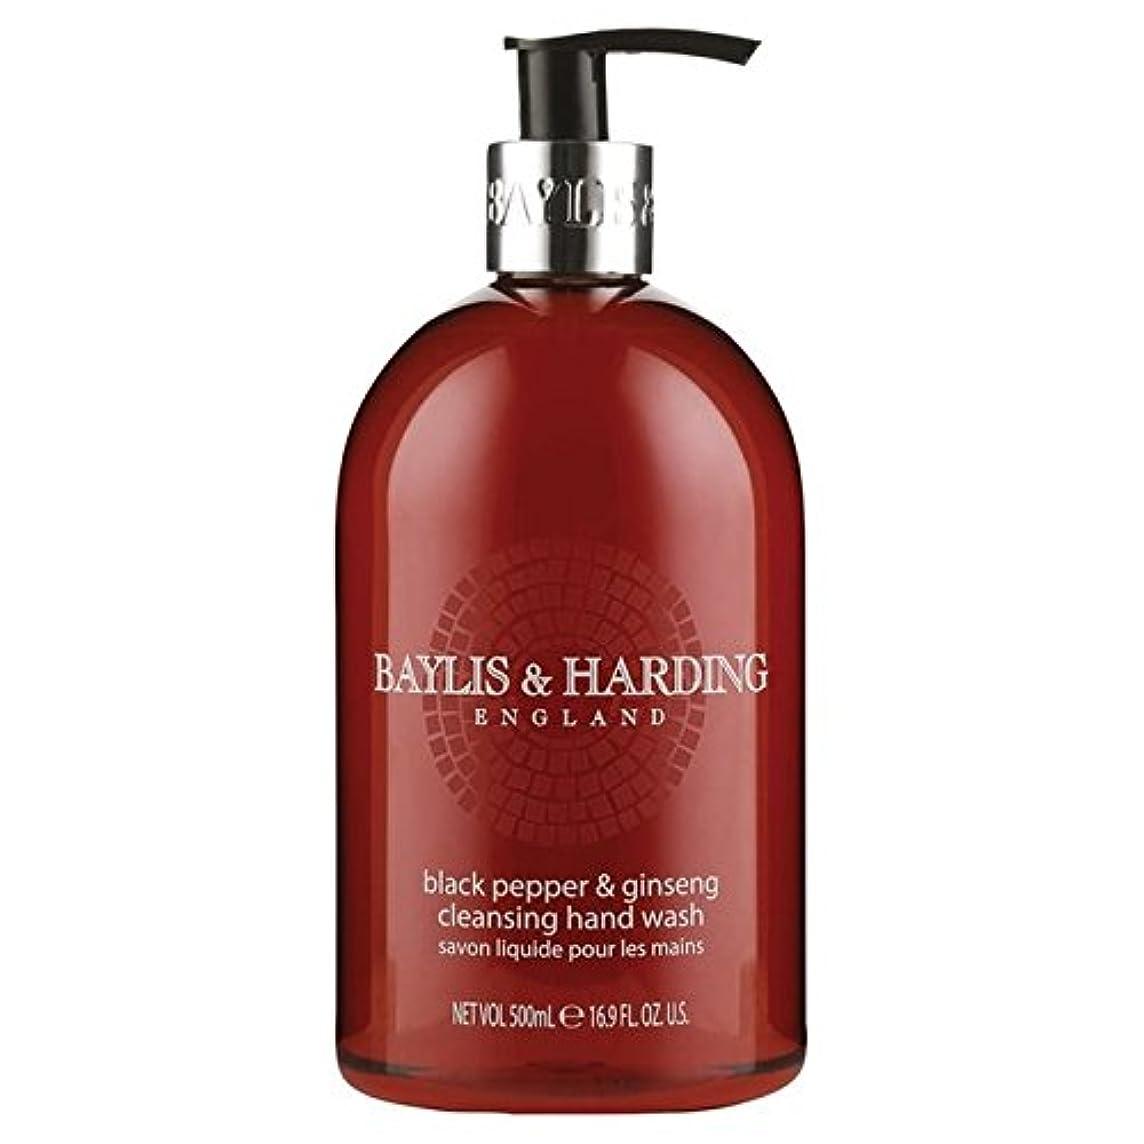 Baylis & Harding Black Pepper & Ginseng Hand Wash 500ml (Pack of 6) - ベイリス&ハーディングブラックペッパー&人参のハンドウォッシュ500ミリリットル...